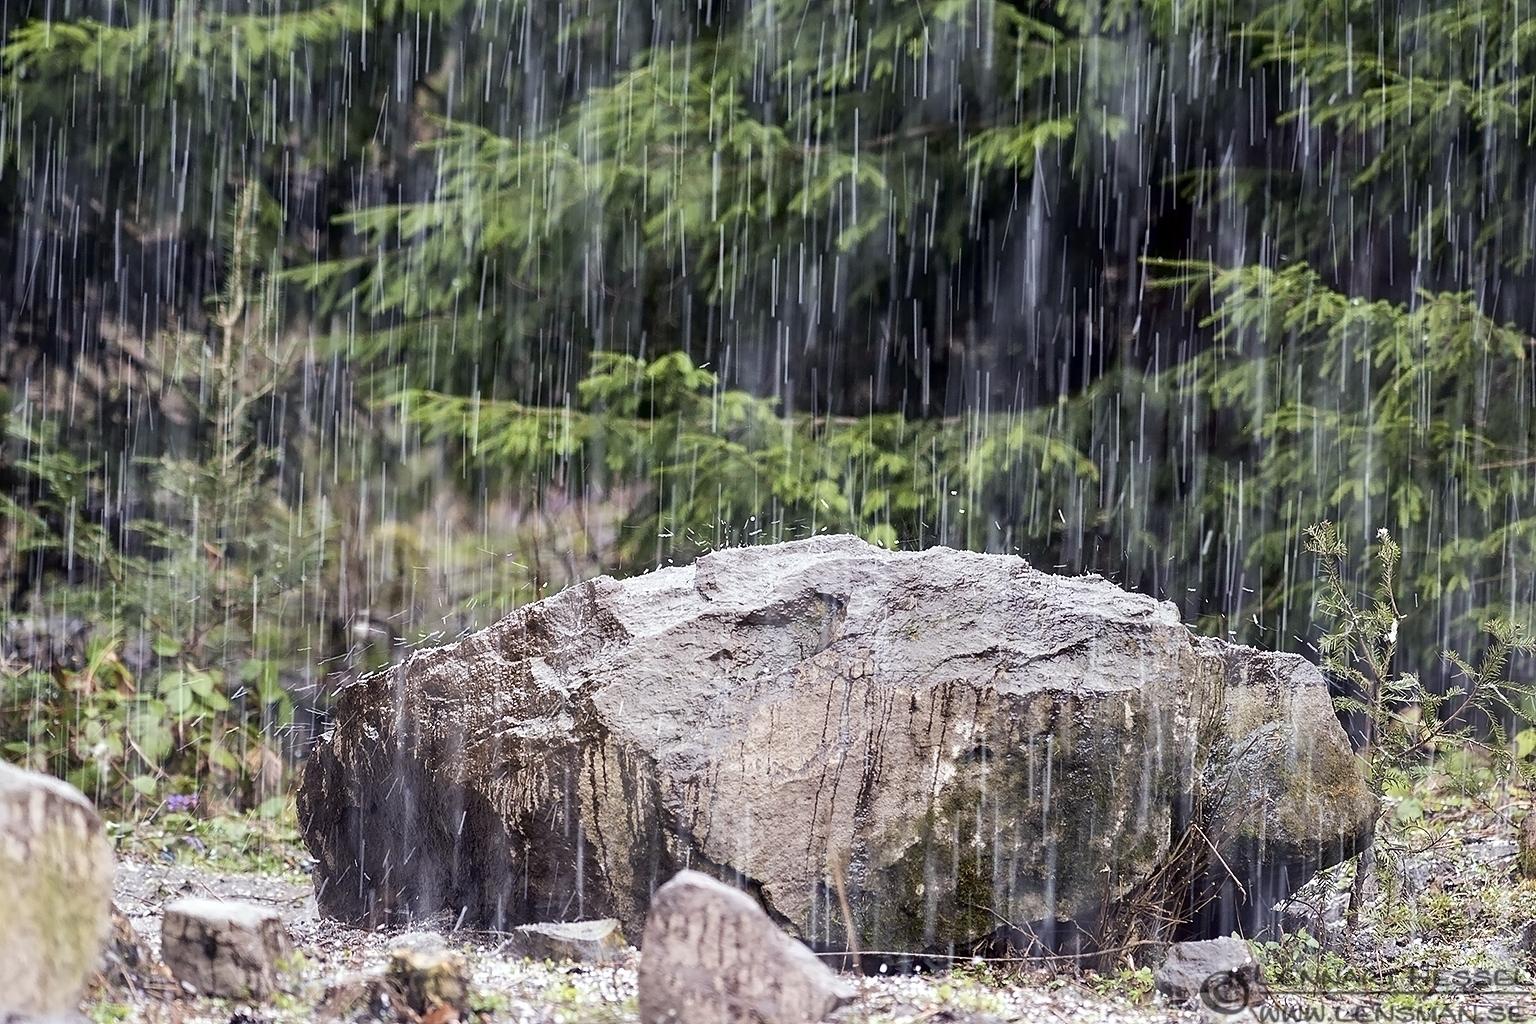 Hailstorm Transylvania, Romania